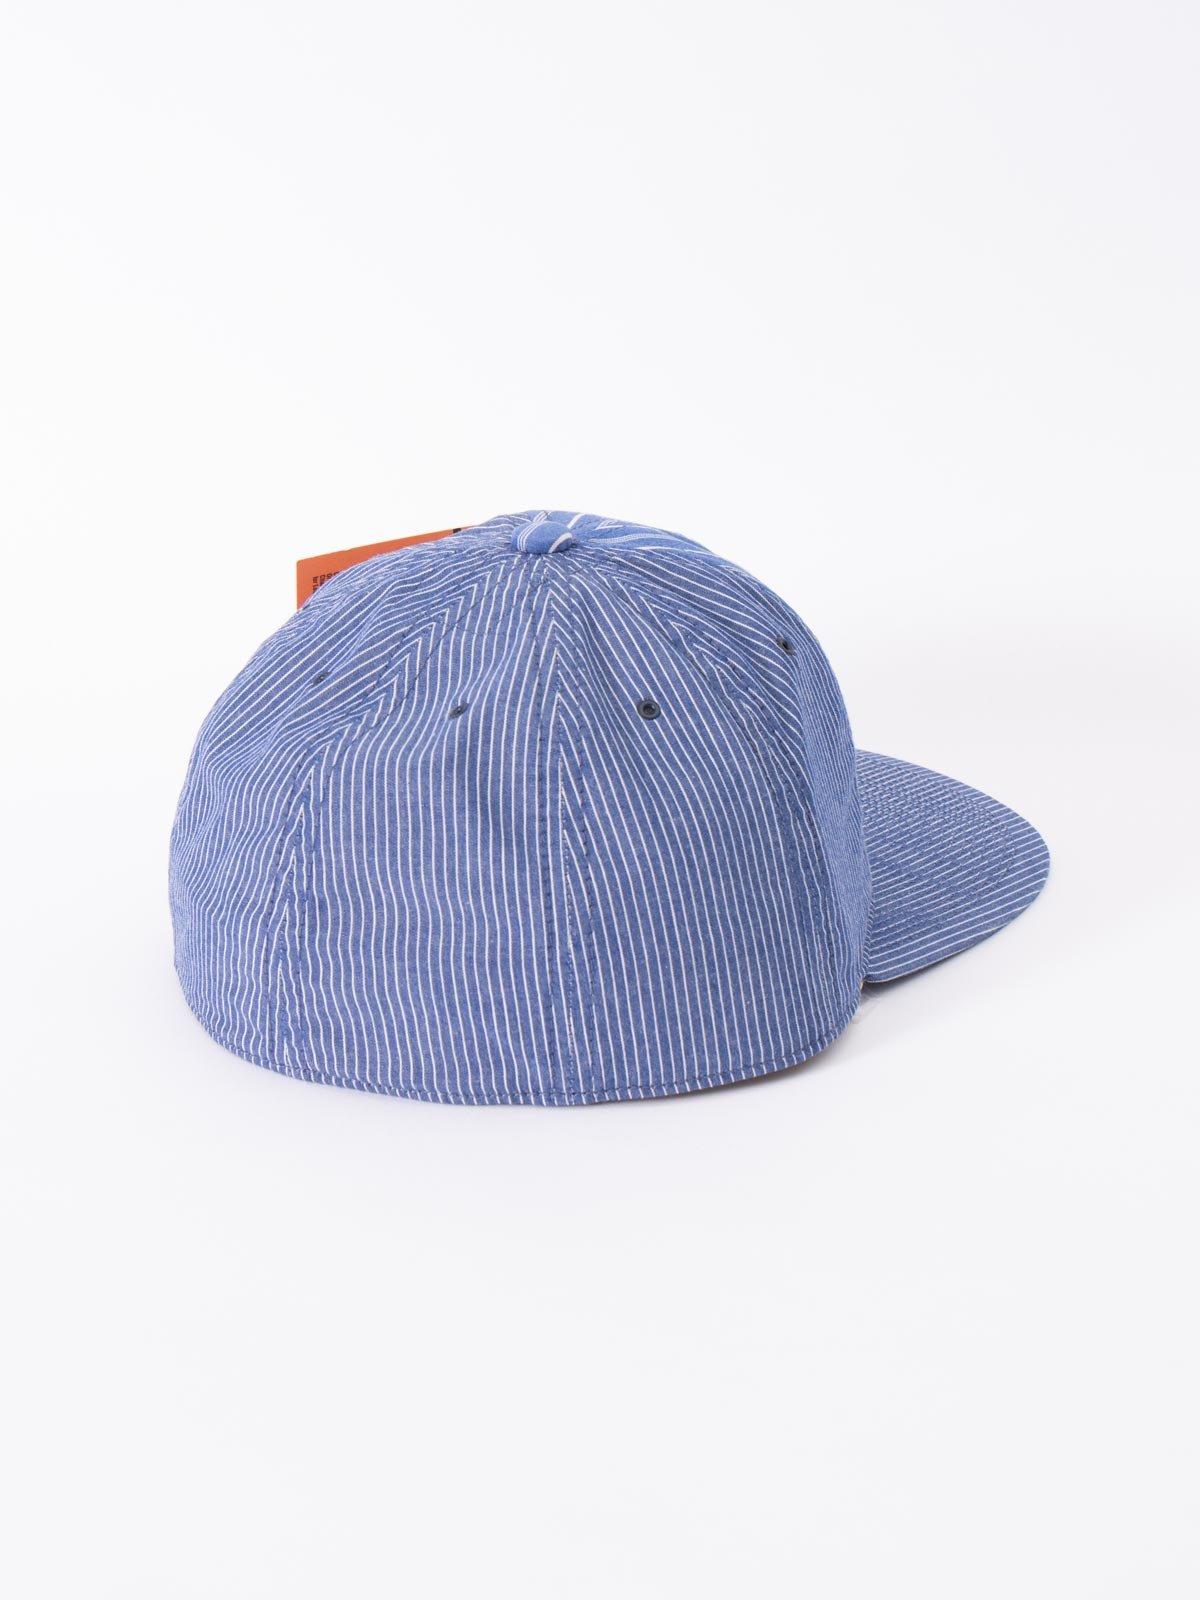 BLUE JAPANESE CHAMBRAY CAP - Image 2